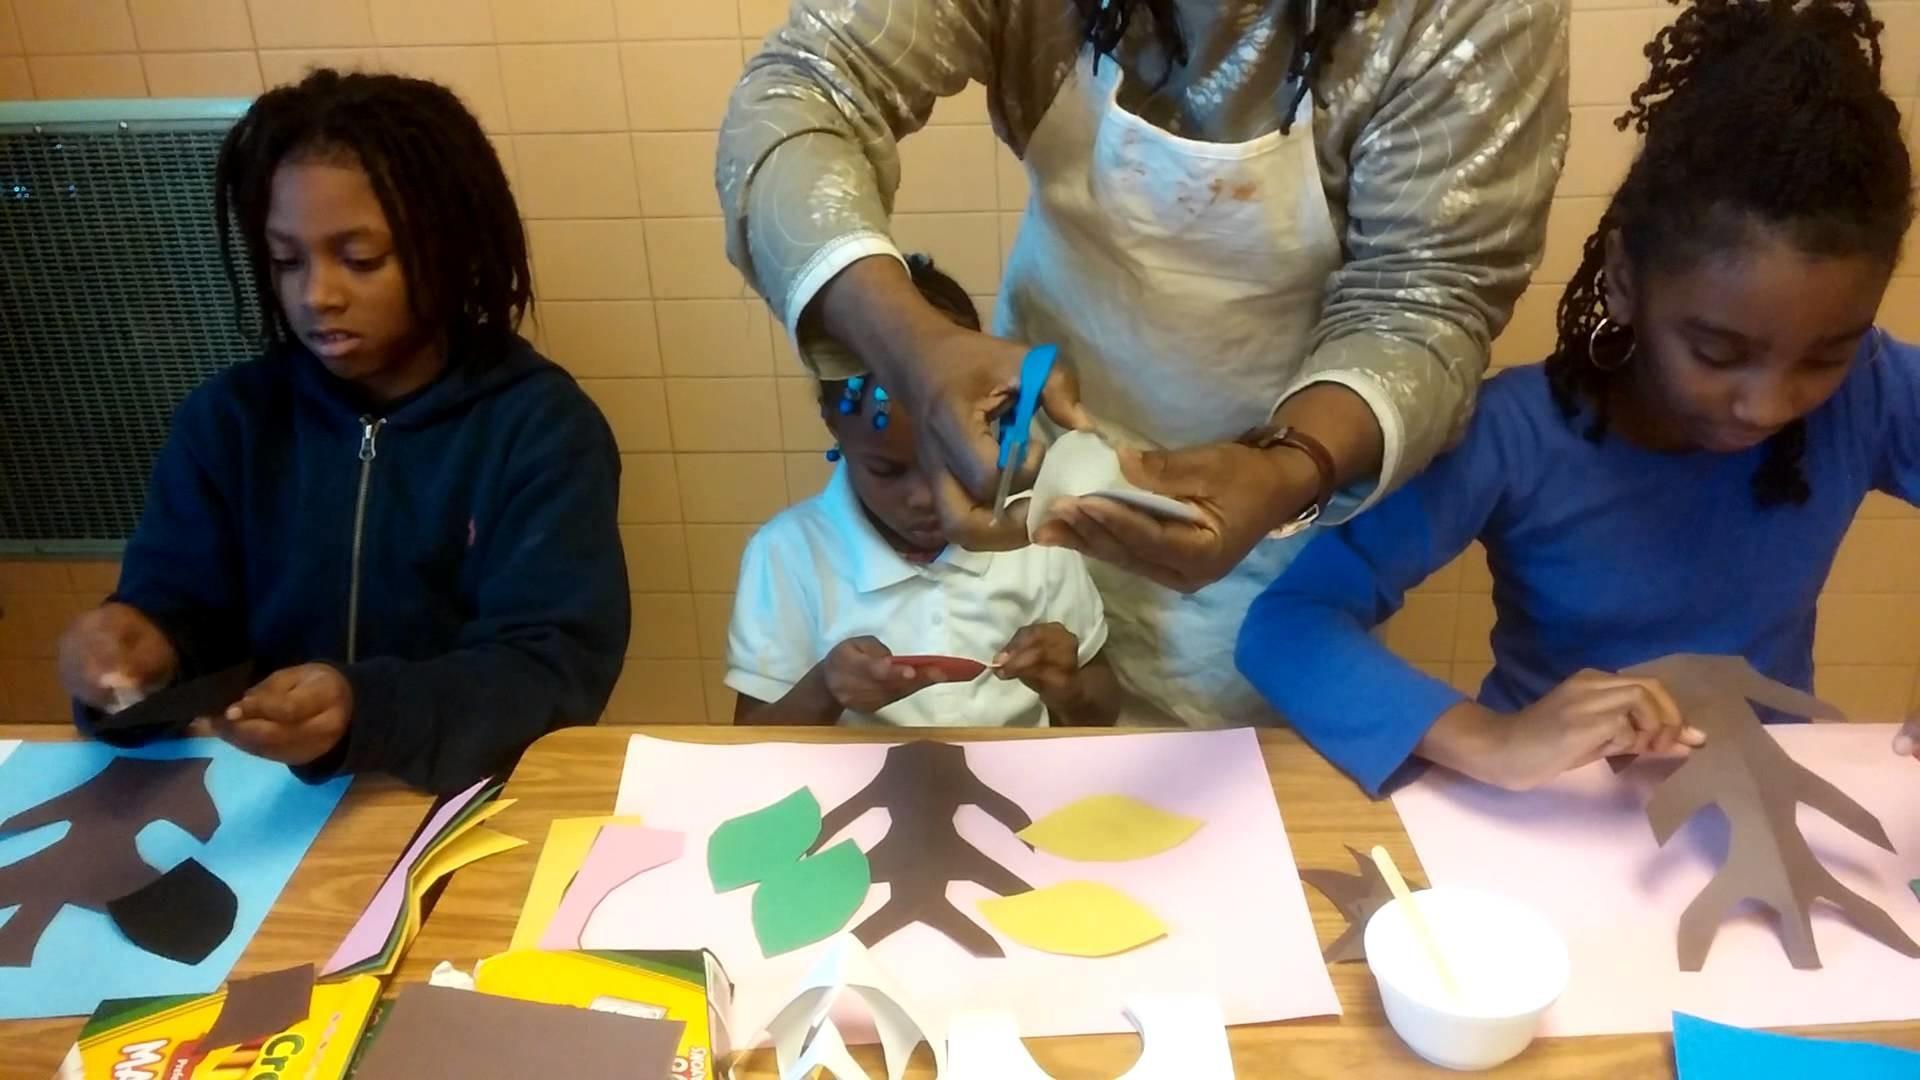 TEACHING KIDS TO MAKE A FAMILY TREE,SIR JAMES L. THORNHILL 2014 CHIMBORAZO ELEMENTRY SCHOOL